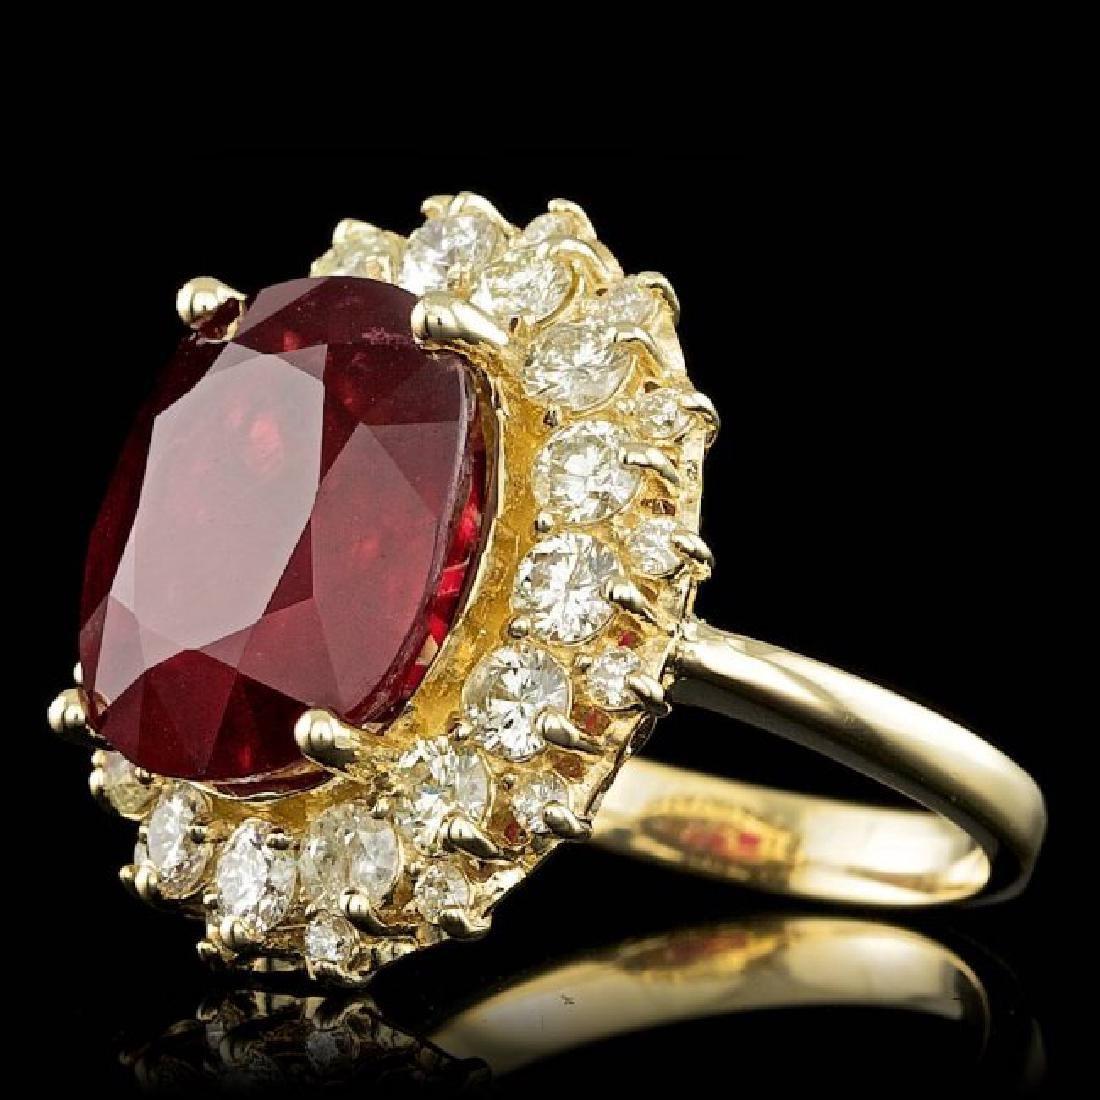 14k Yellow Gold 11.50ct Ruby 1.65ct Diamond Ring - 2